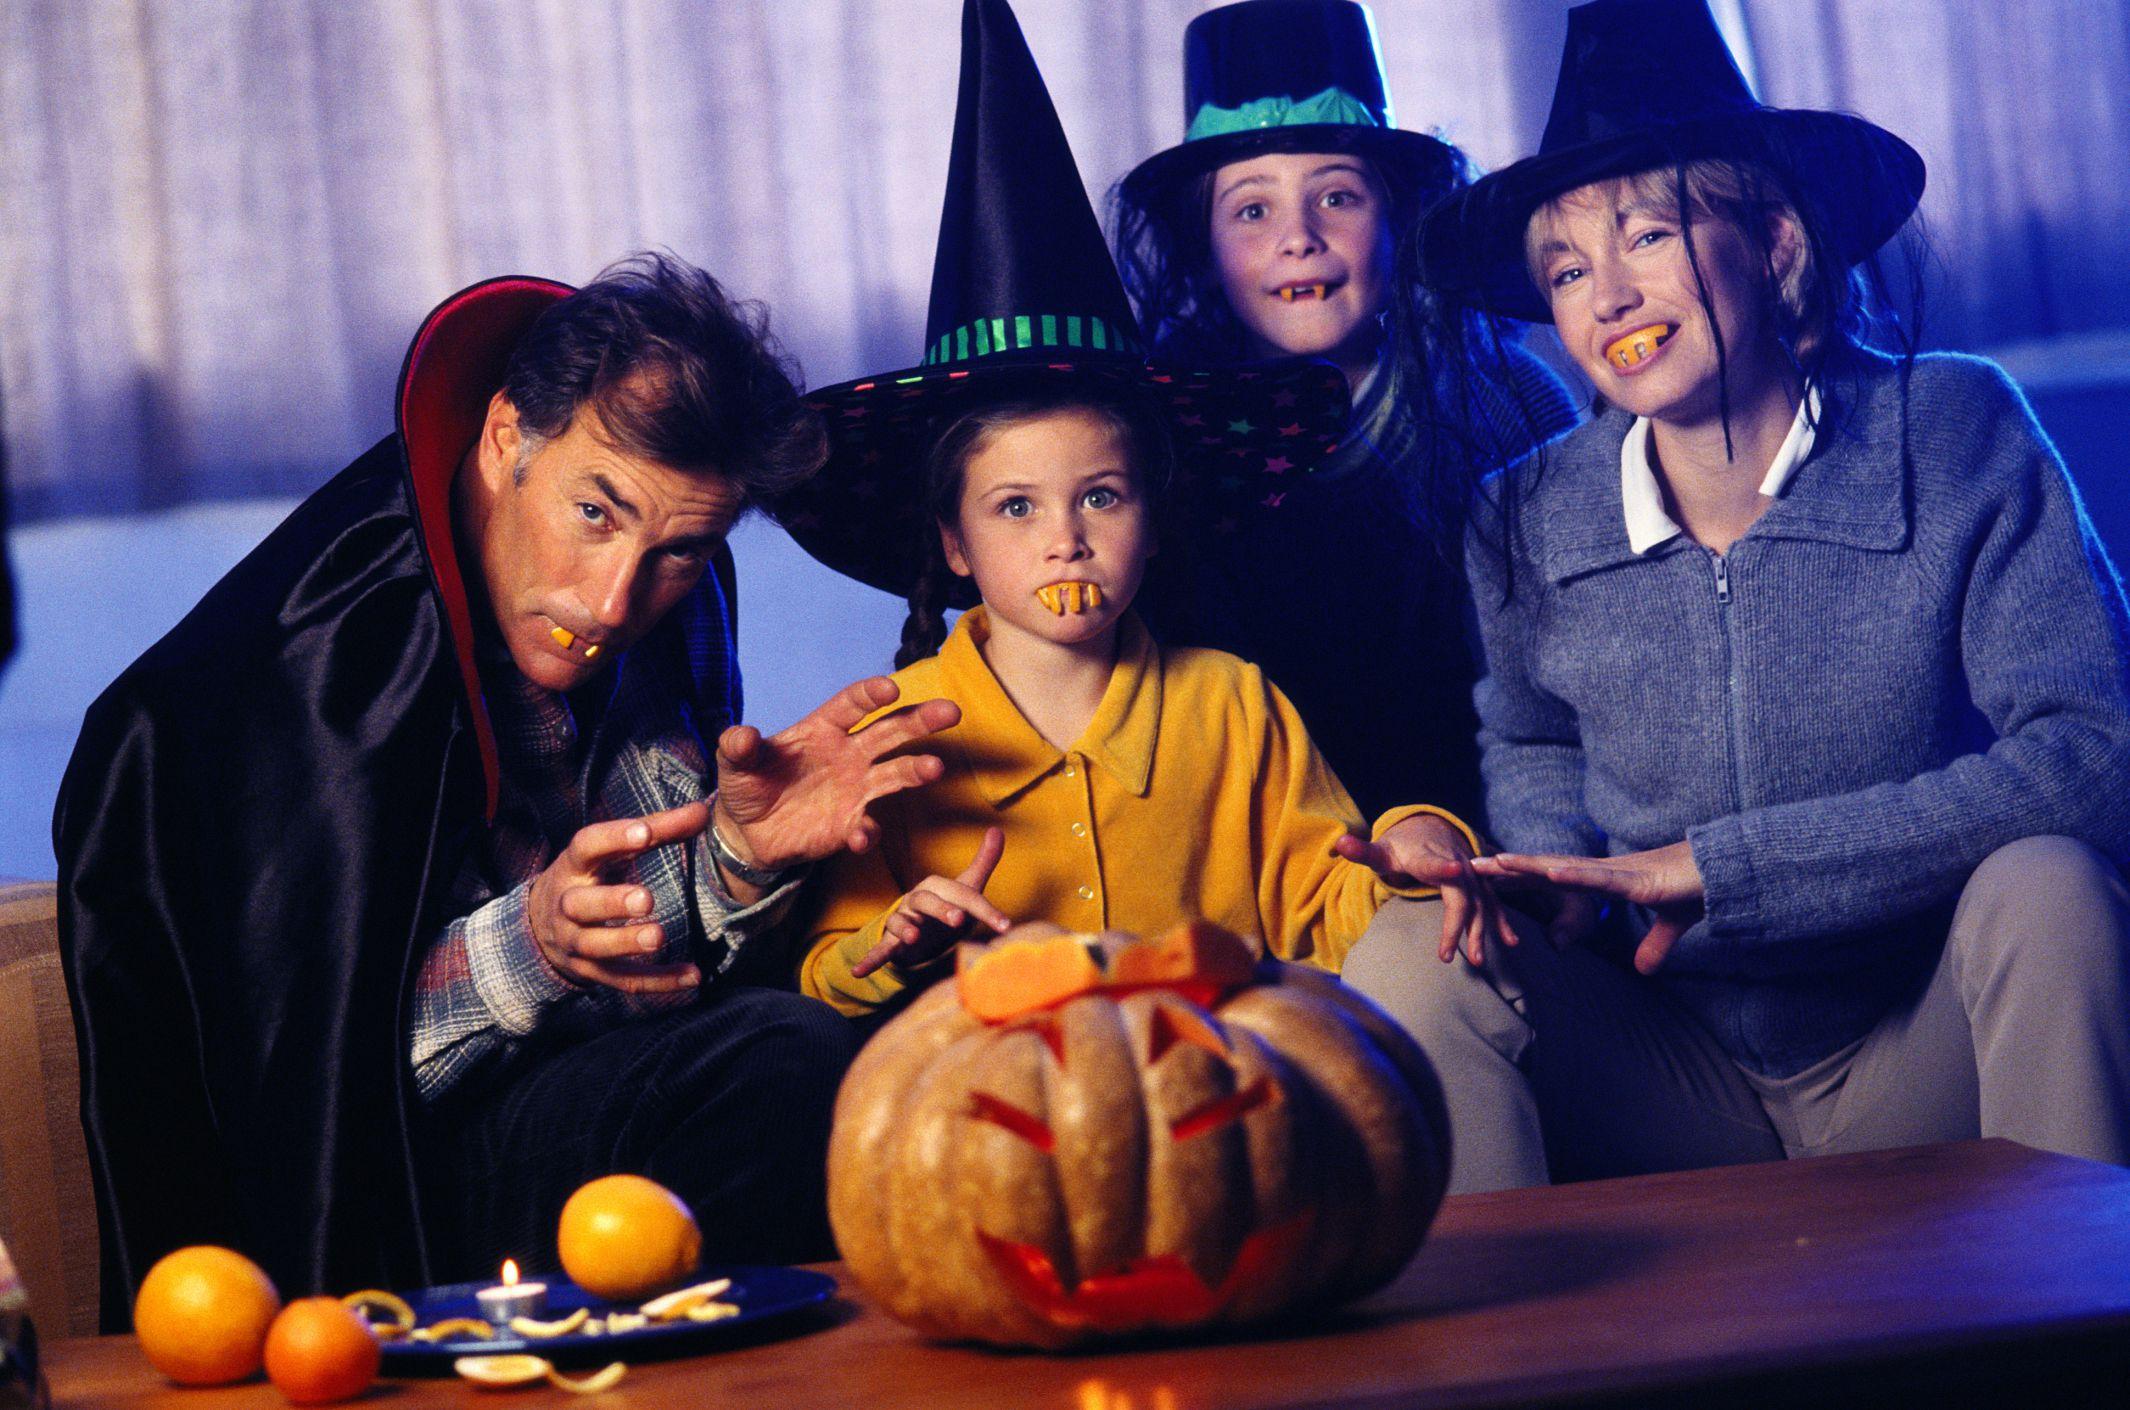 halloween-party-adults-kids-56a3256b5f9b58b7d0d09616.jpg